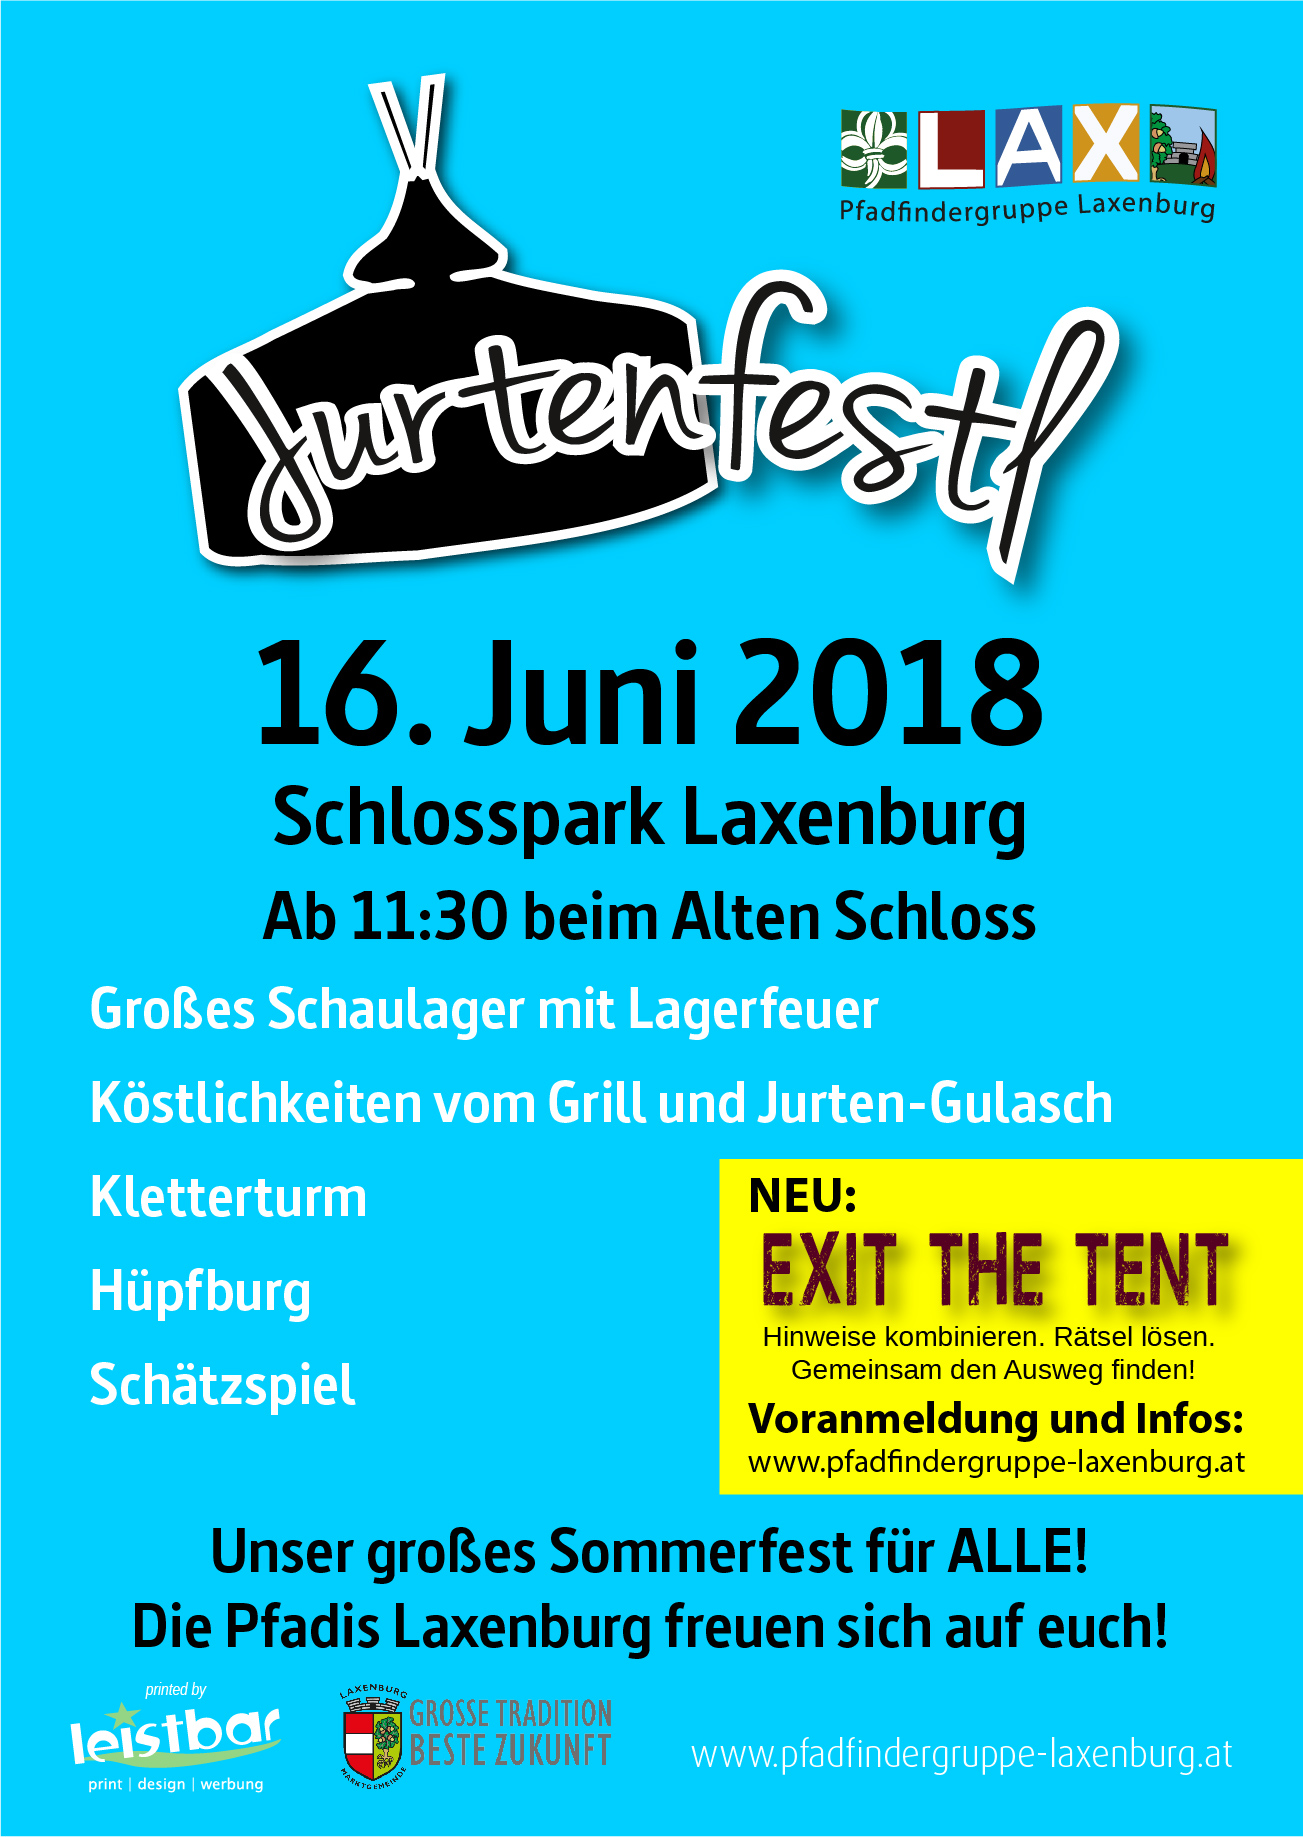 jurtenfestl_plakat2018_exit